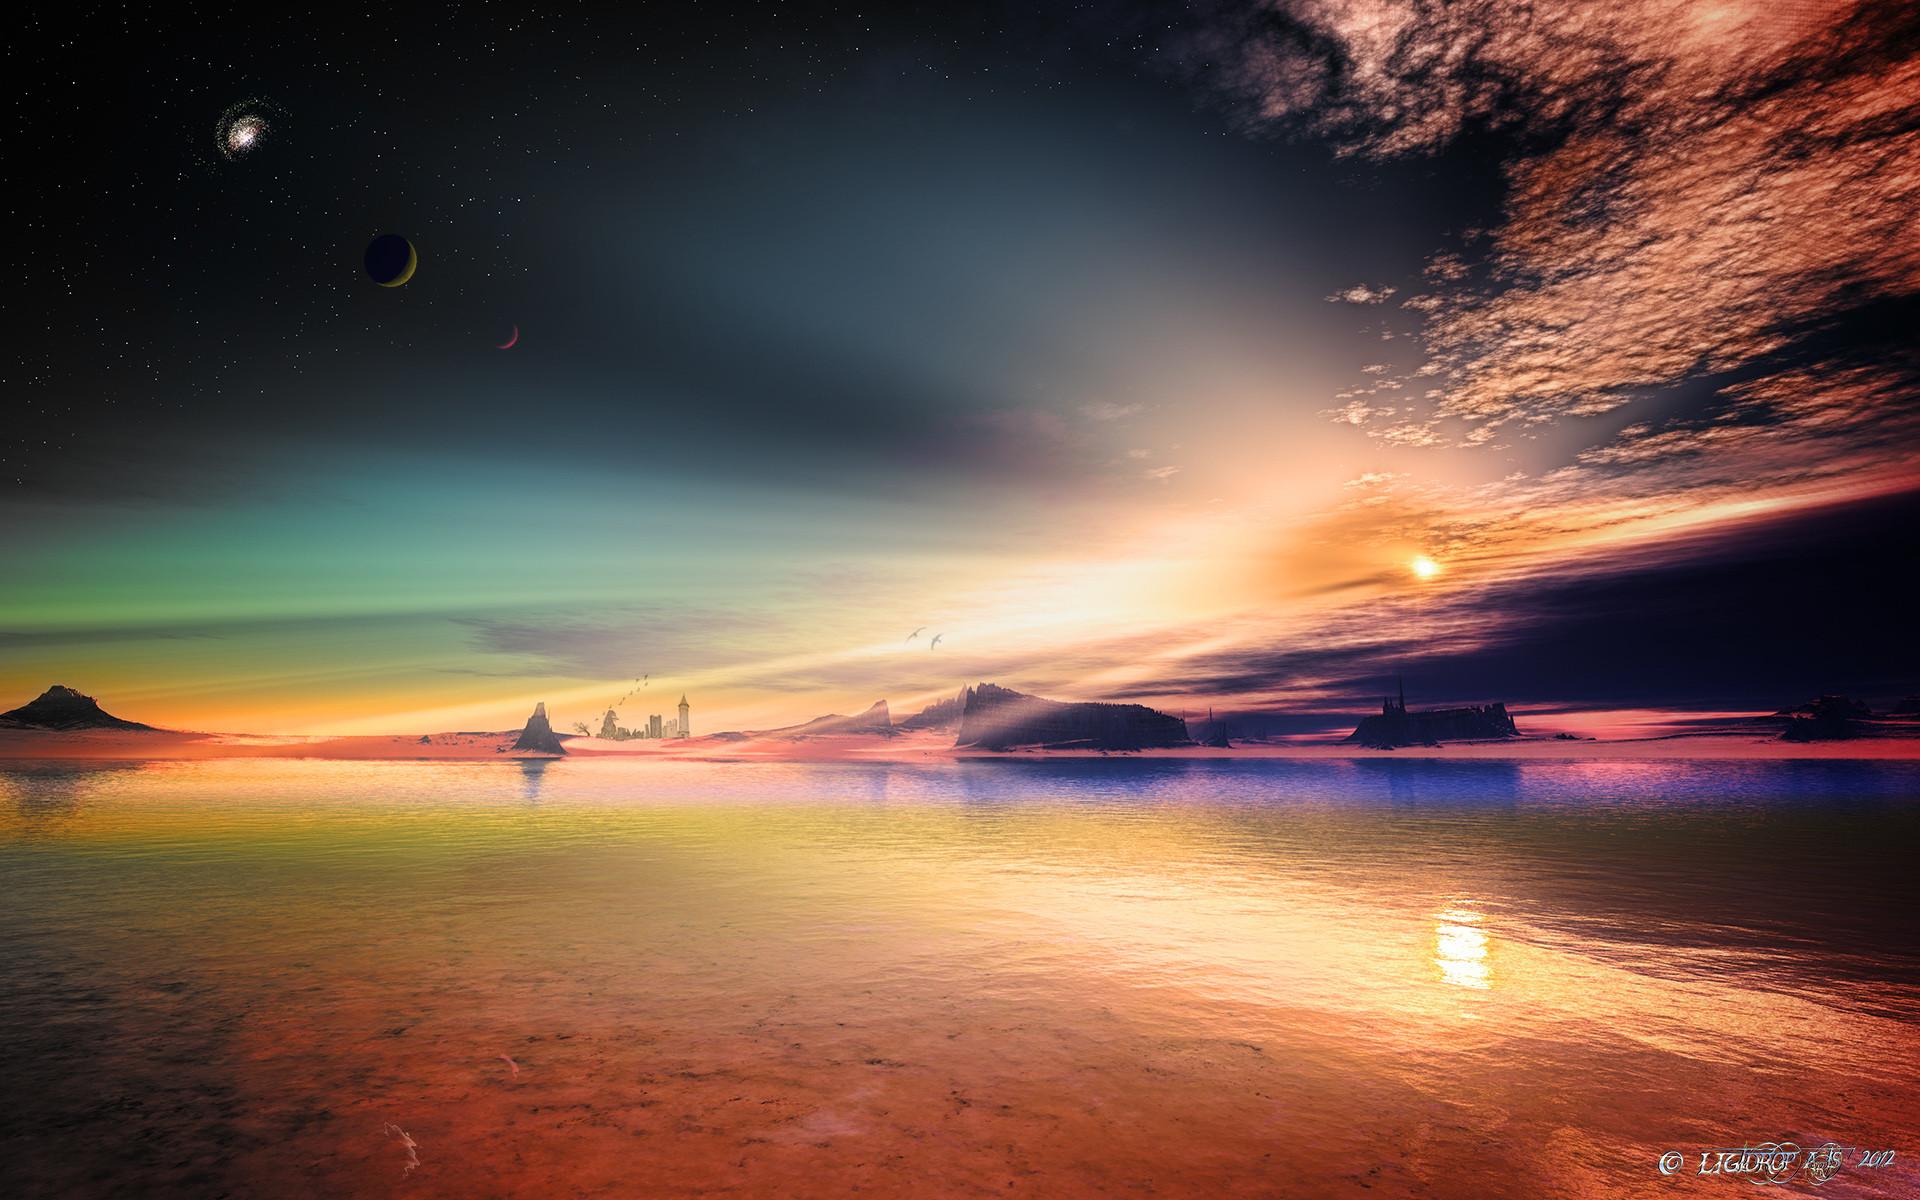 Art alien planet rocks sky stars lakeslandscape reflection sunset castle  wallpaper | | 72035 | WallpaperUP